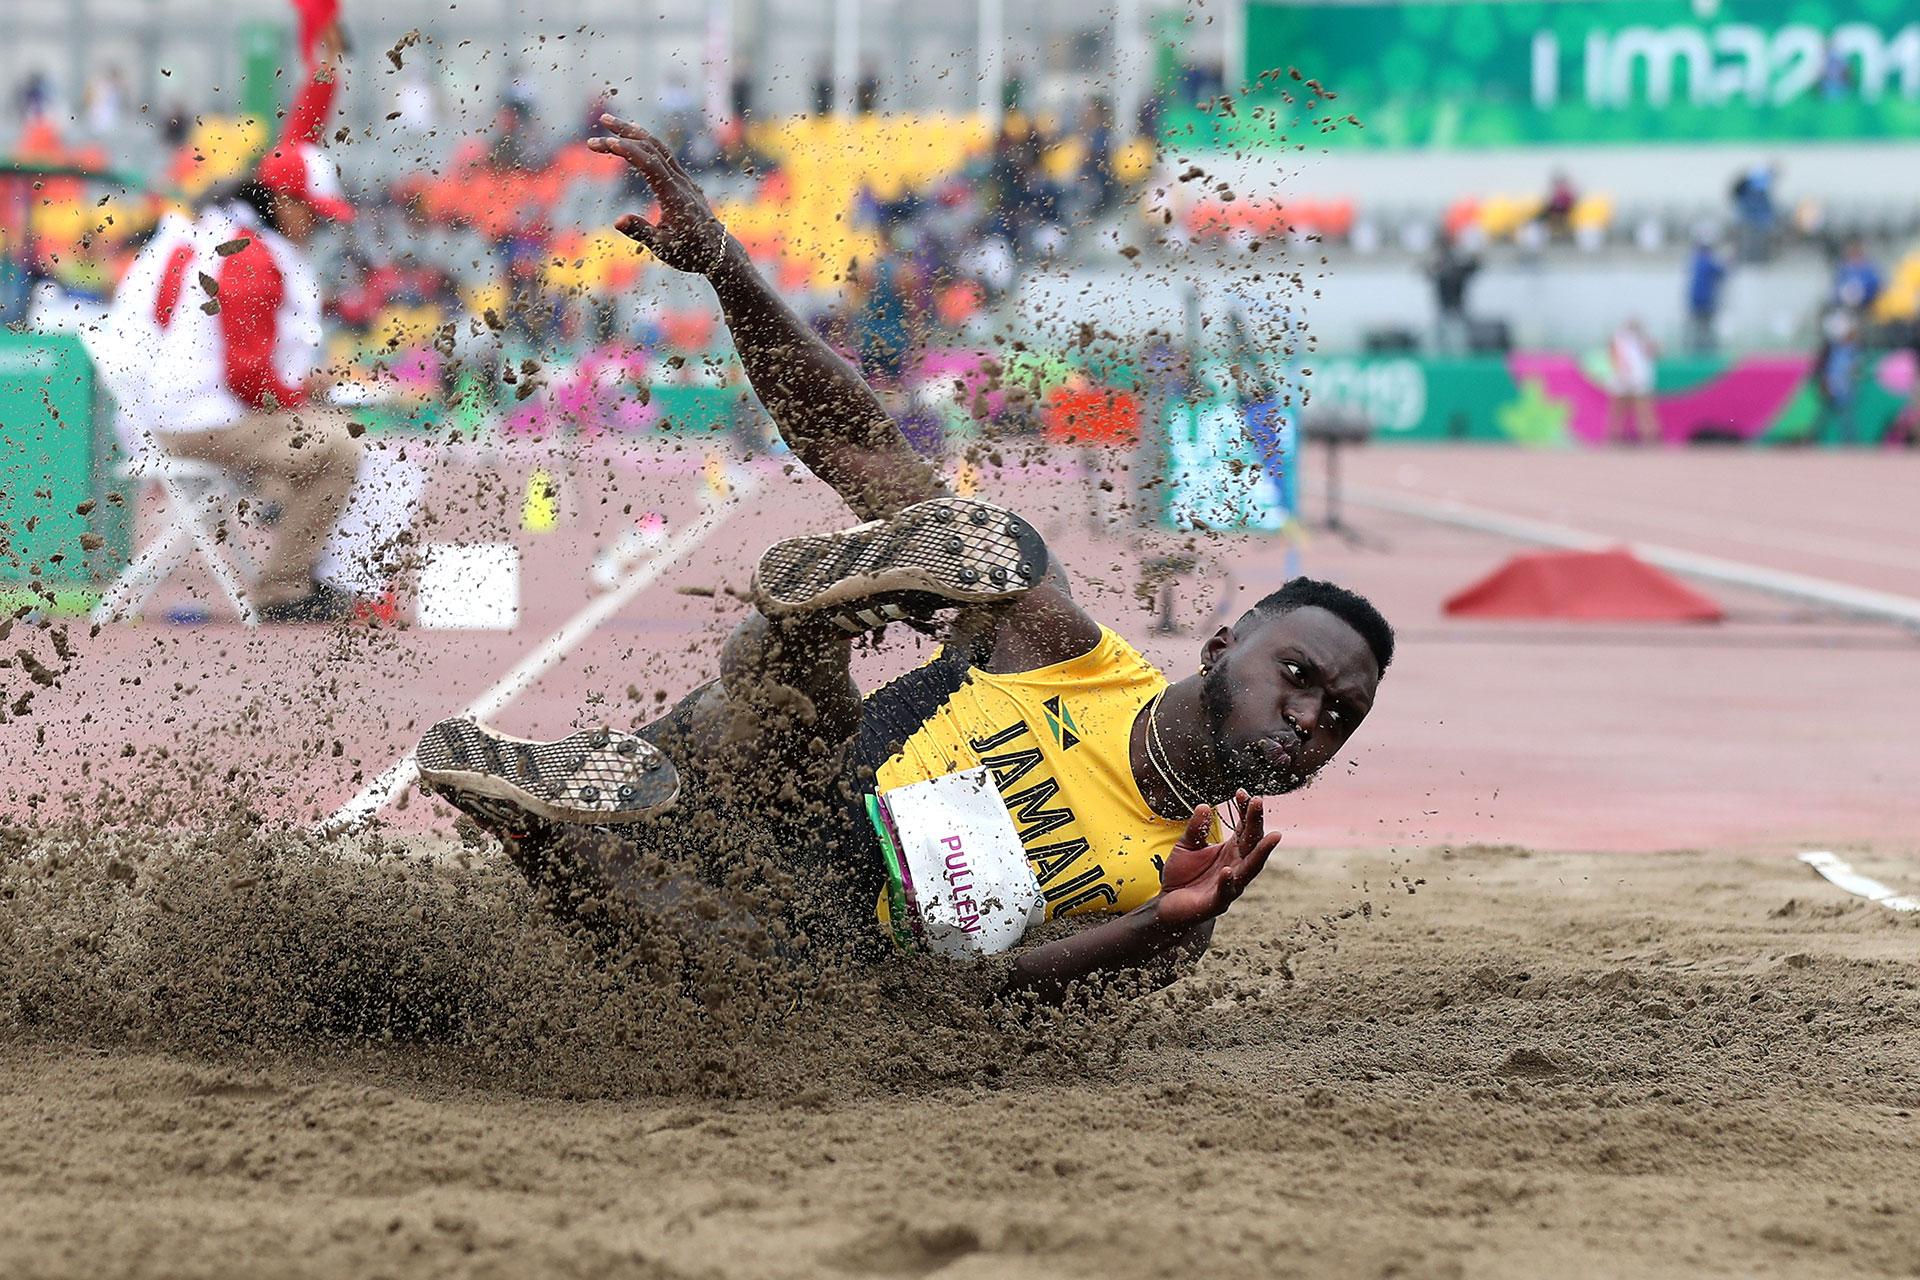 XVIII Pan American Games - Lima 2019 - Athletics - Men's Triple Jump Final - Athletics Stadium, Lima, Peru - August 10, 2019. Jamaica's Clive Pullen in action. REUTERS/Henry Romero